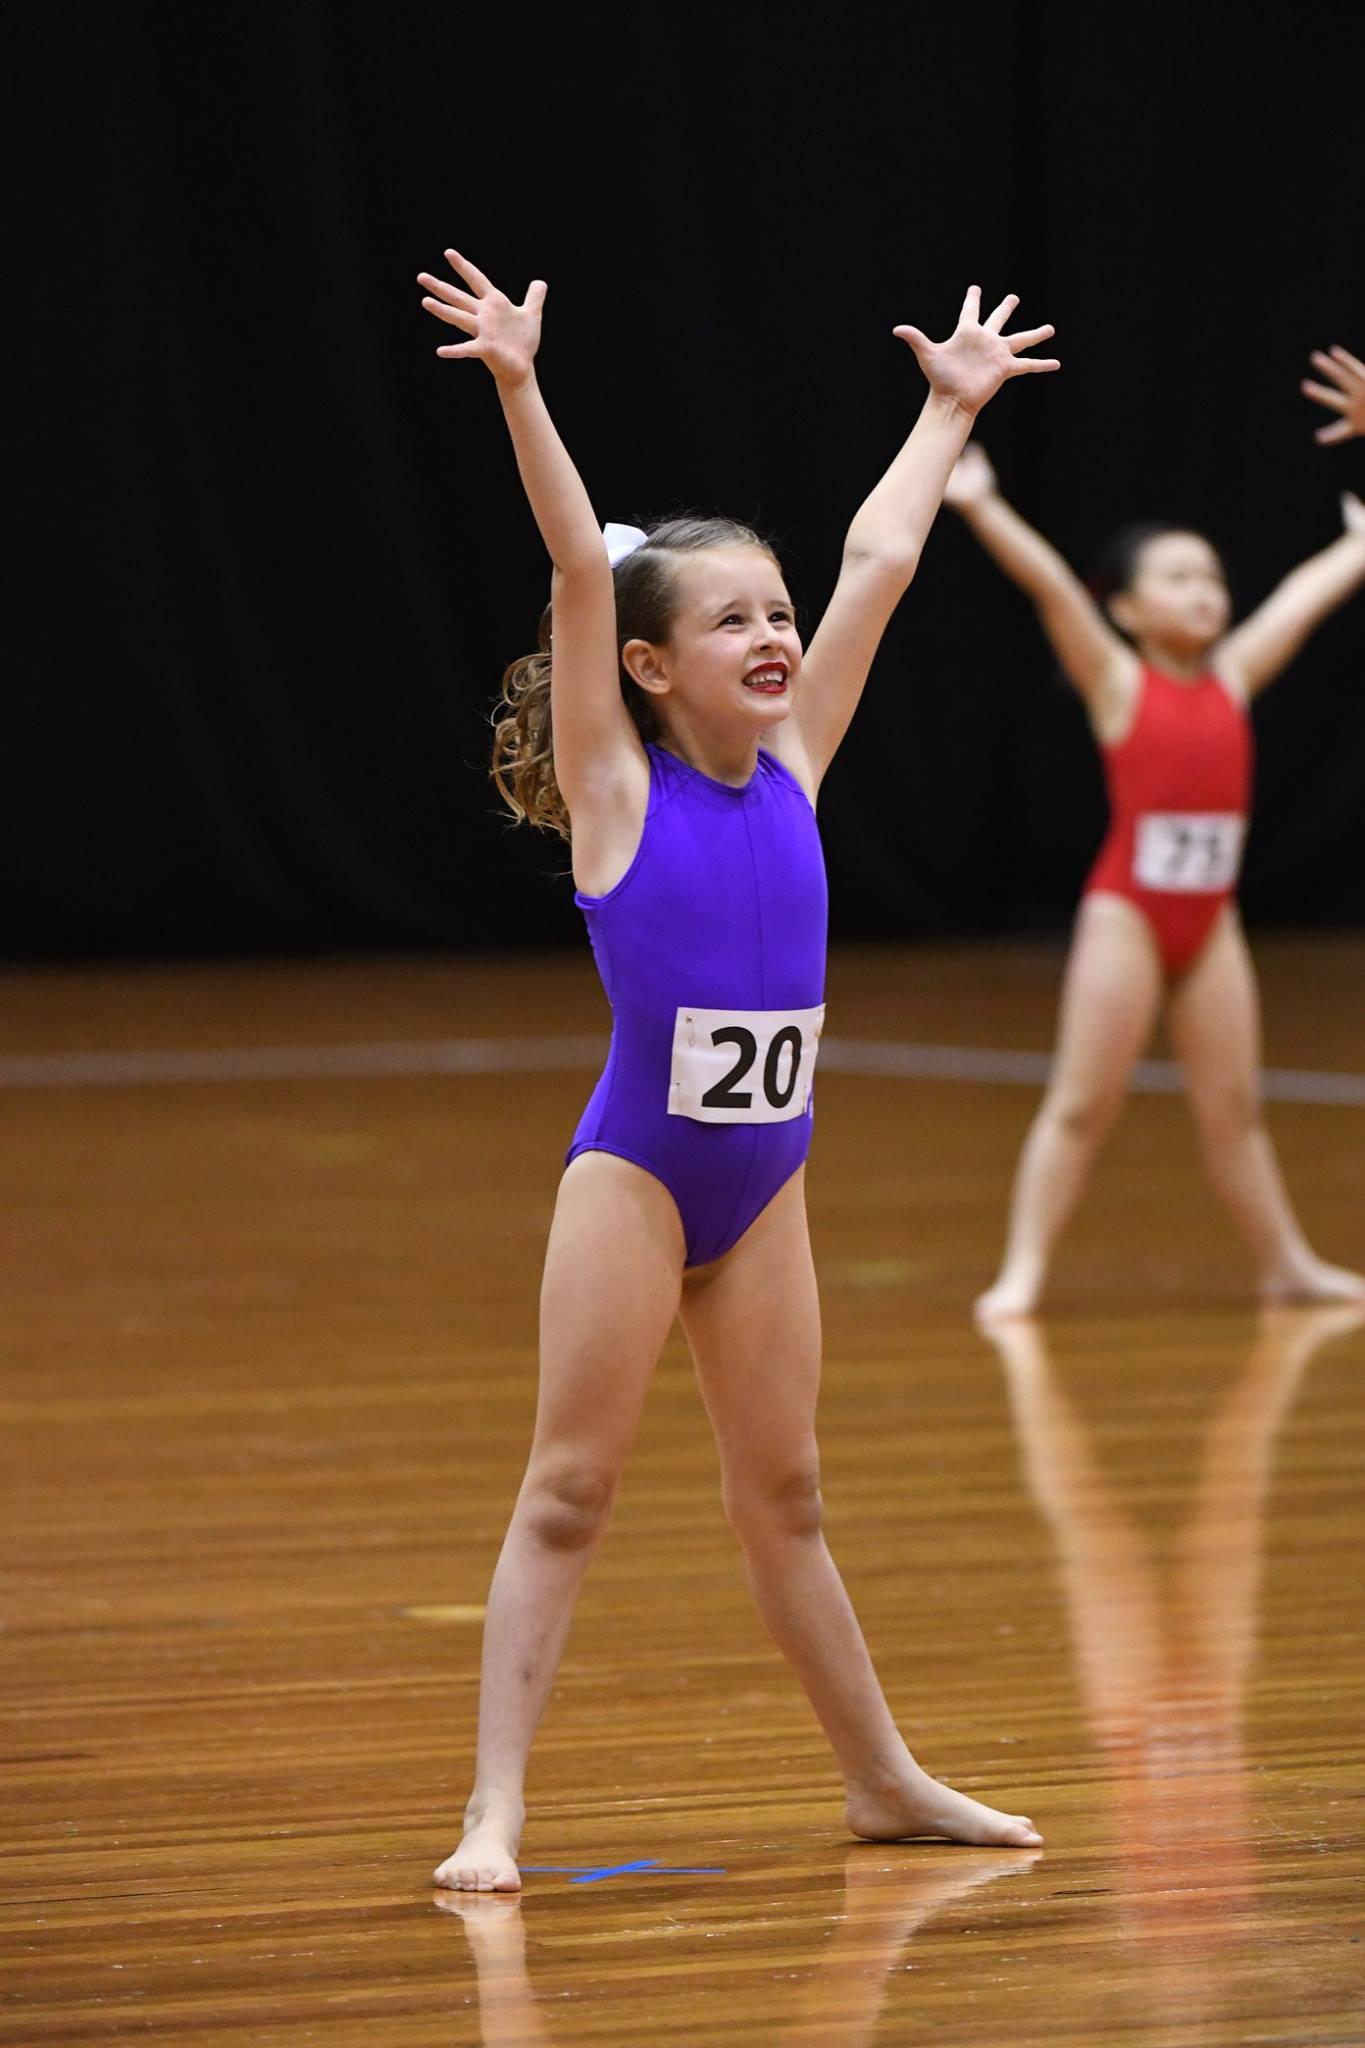 Brisbane North Physie - Preschool childrens Teens Ladies Dance Classes Brisbane North Physical culture club